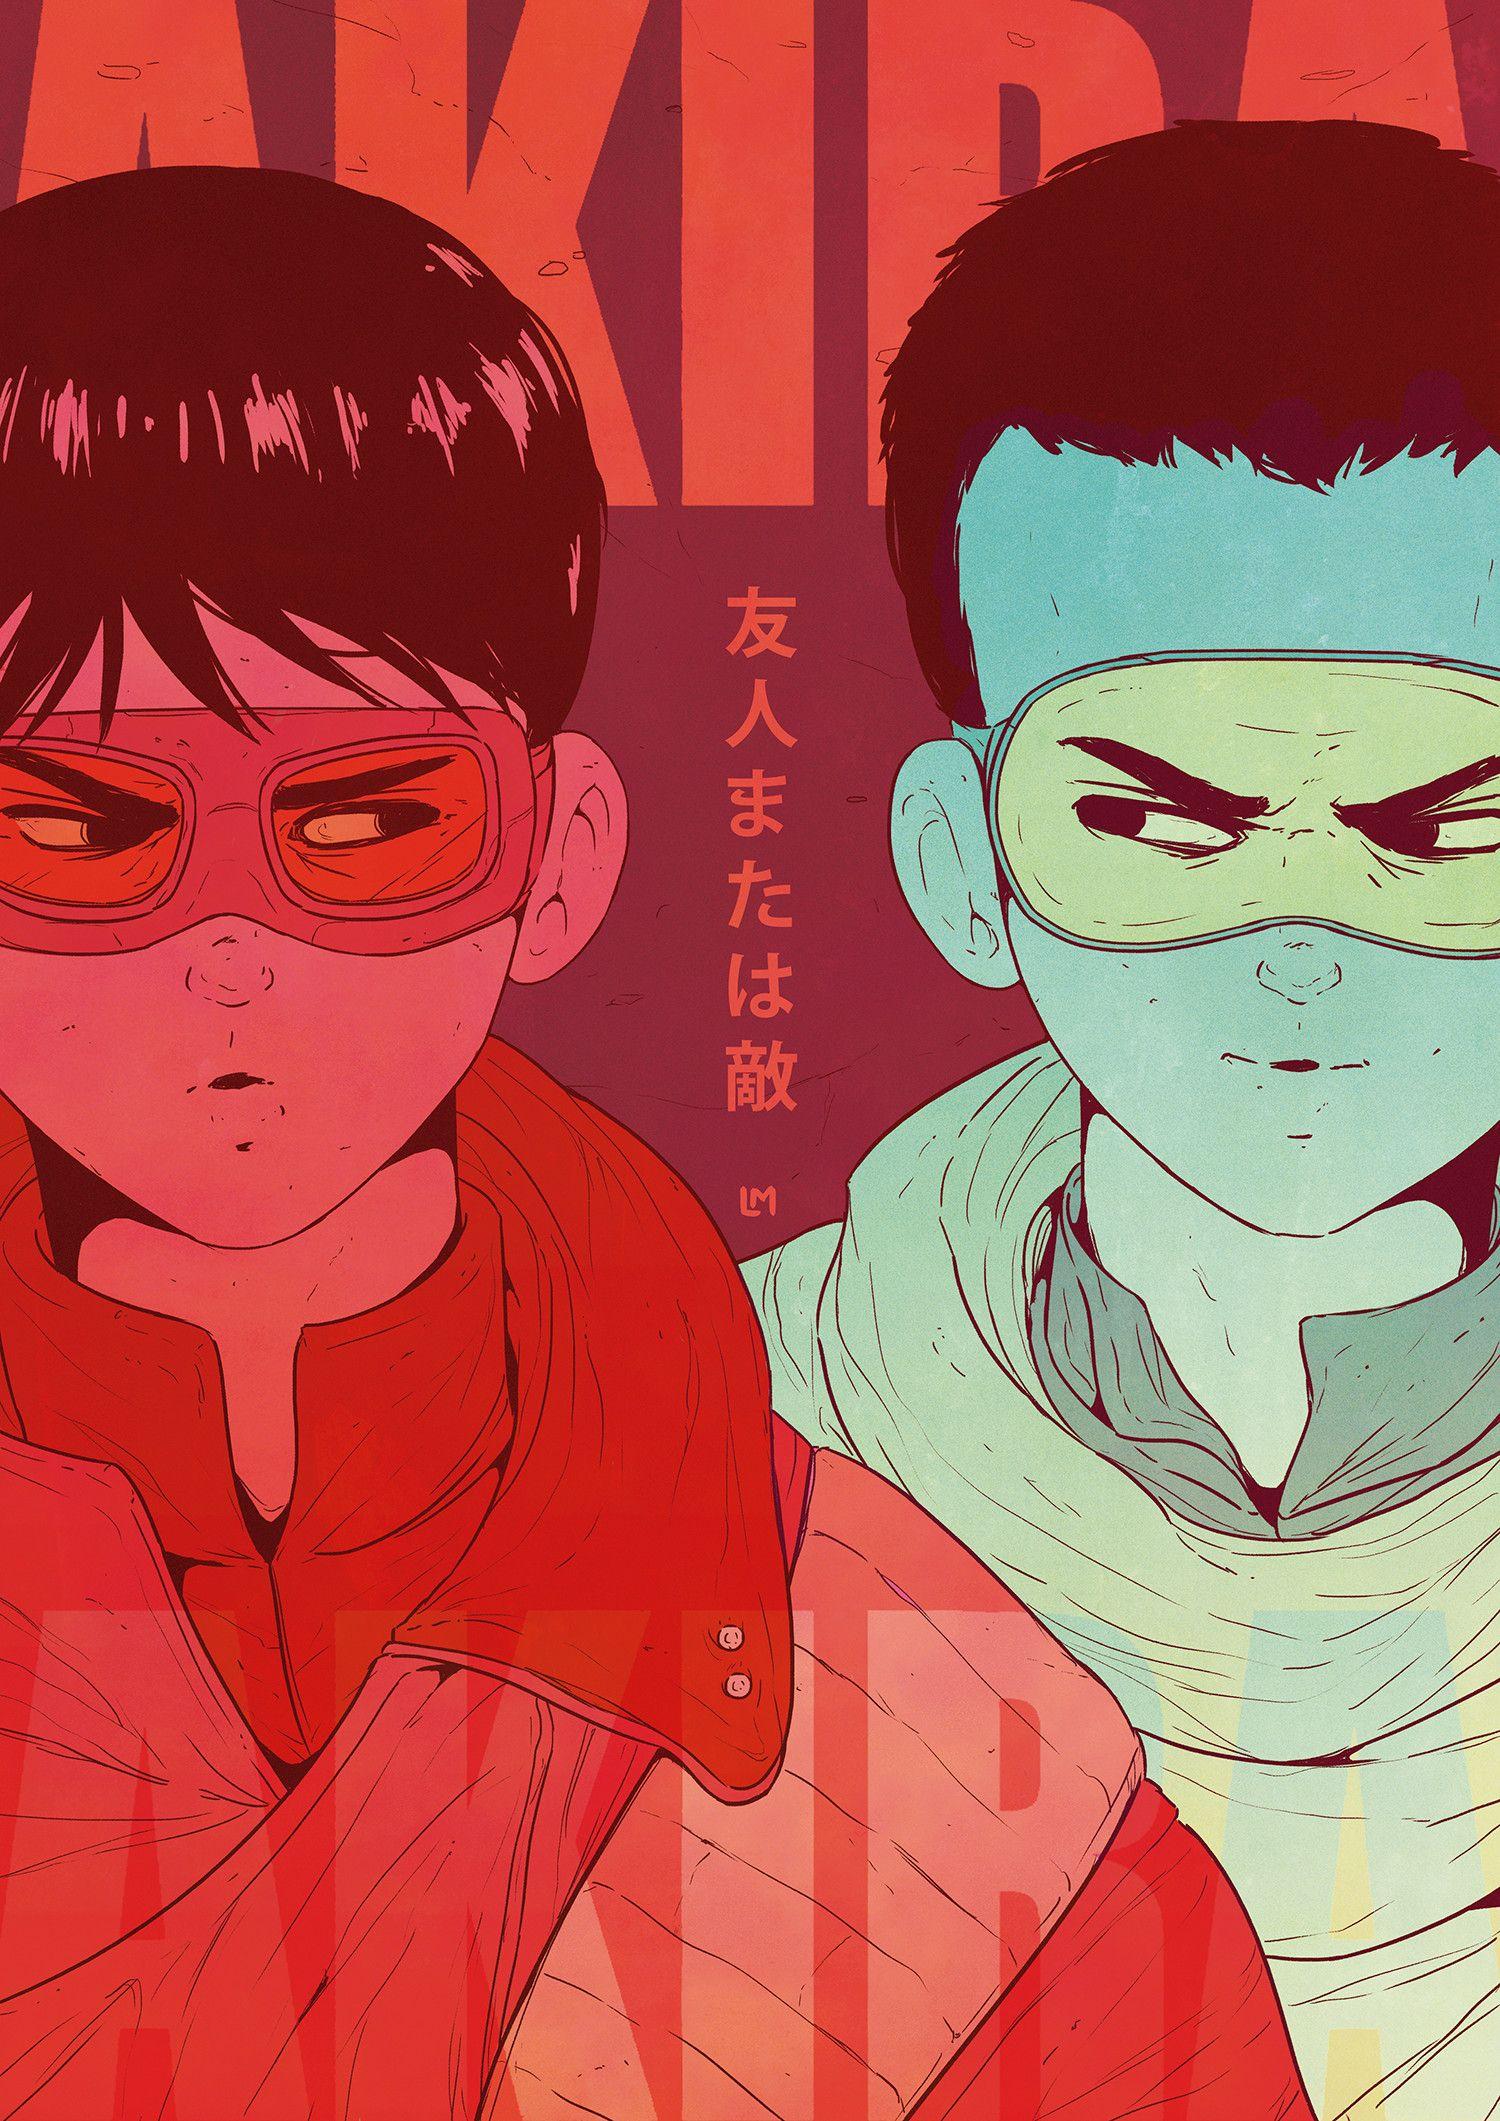 Artstation Akira Poster Lucas Mendonca Akira Anime Akira Poster Akira